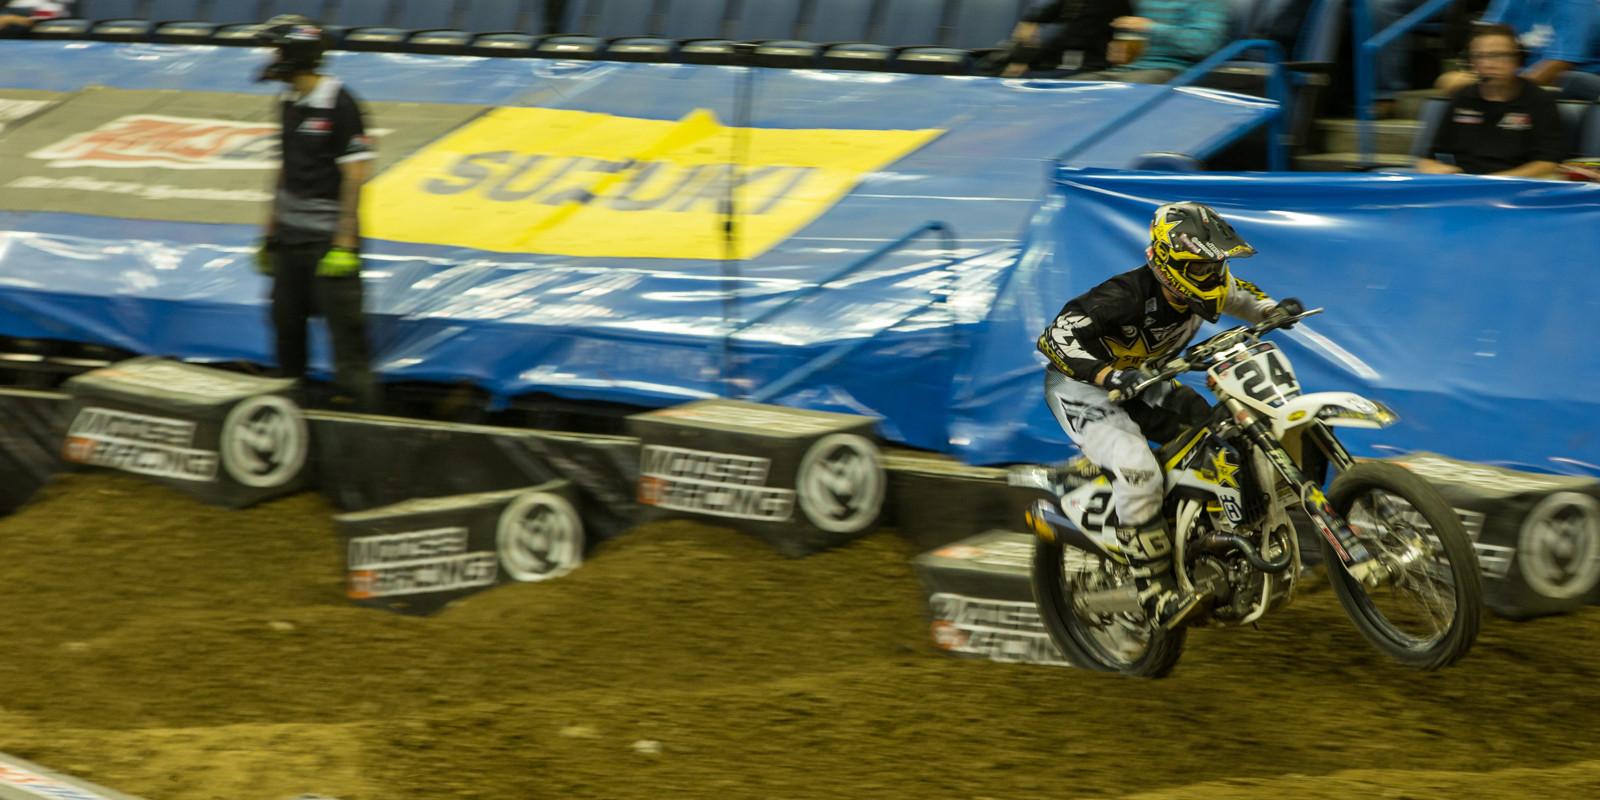 Kyle Bitterman - Photo Gallery: Ontario Arenacross - Saturday Night - Motocross Pictures - Vital MX